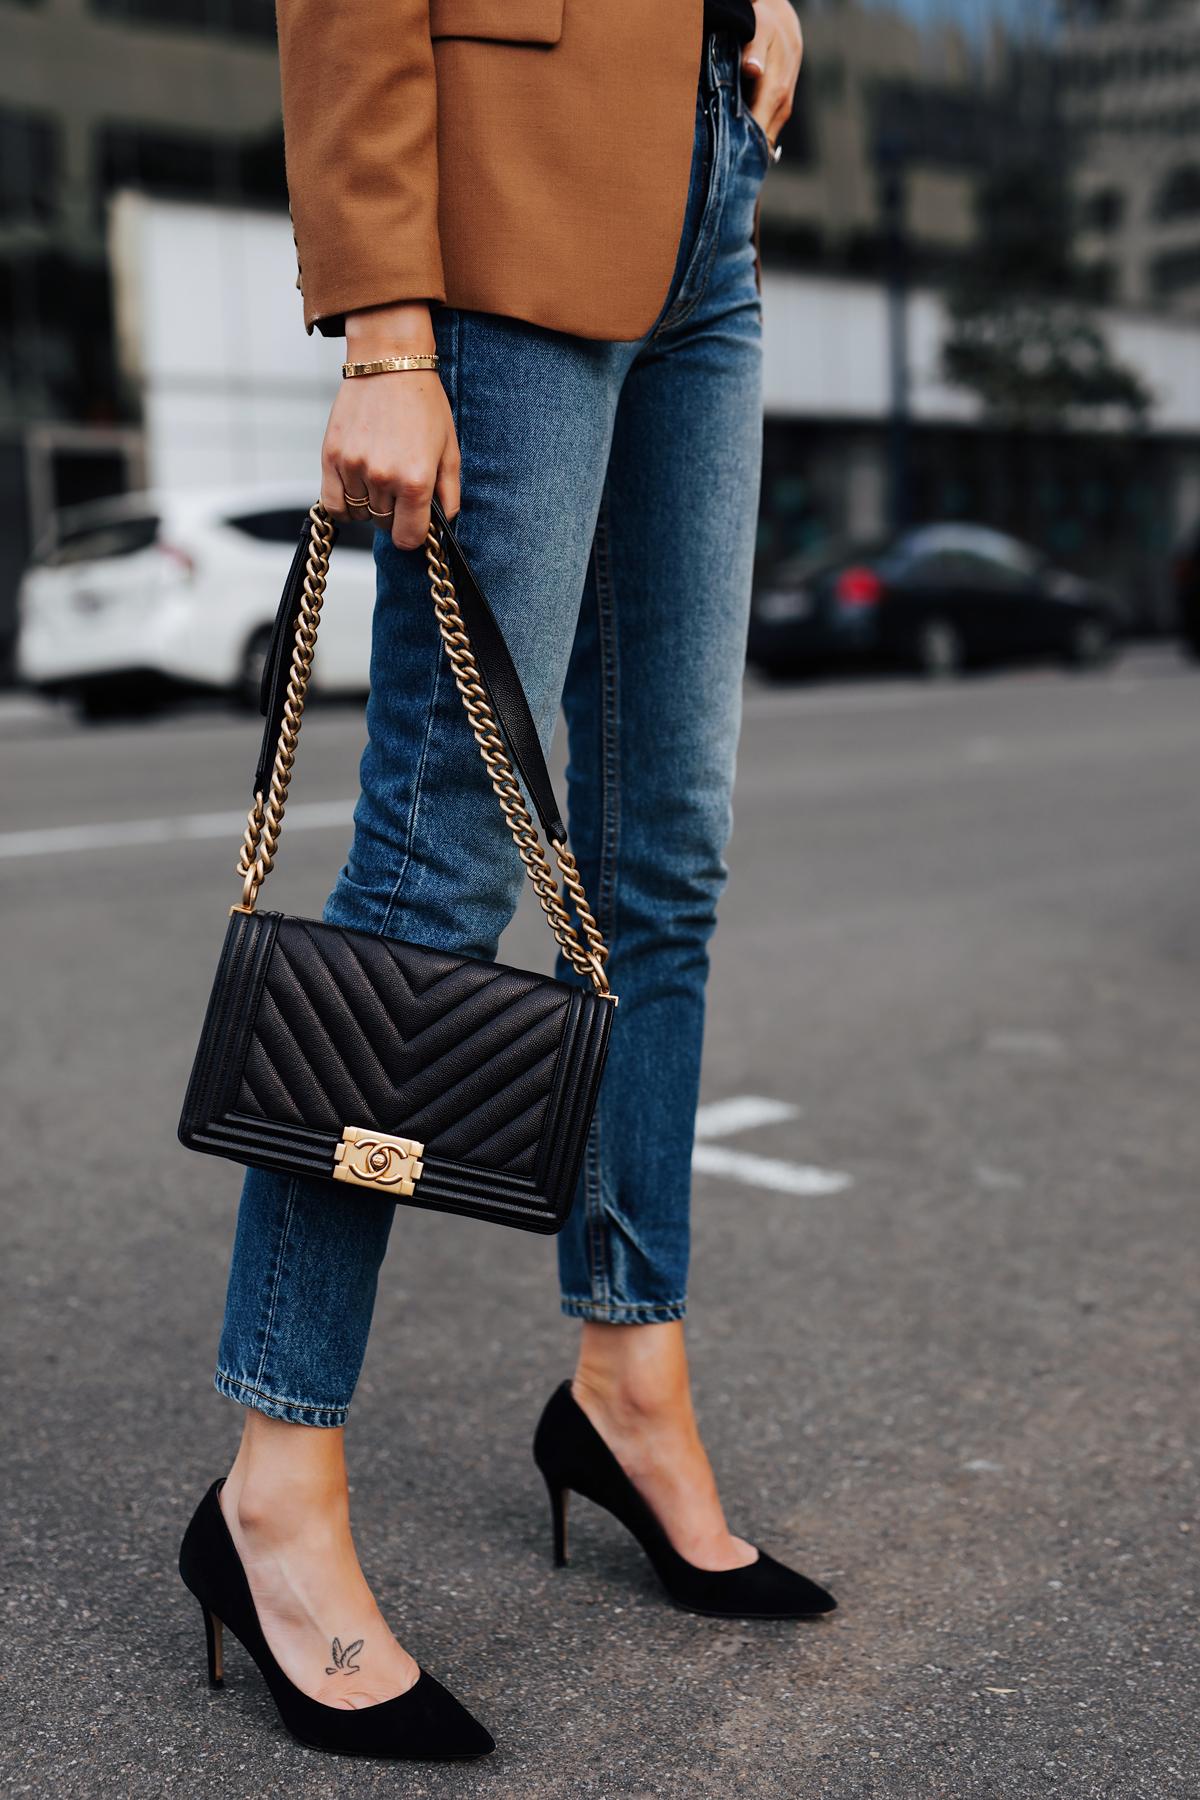 Woman Wearing Camel Blazer Denim Skinny Jeans Black Pumps Chanel Black Boy Bag Fashion Jackson San Diego Fashion Blogger Street Style